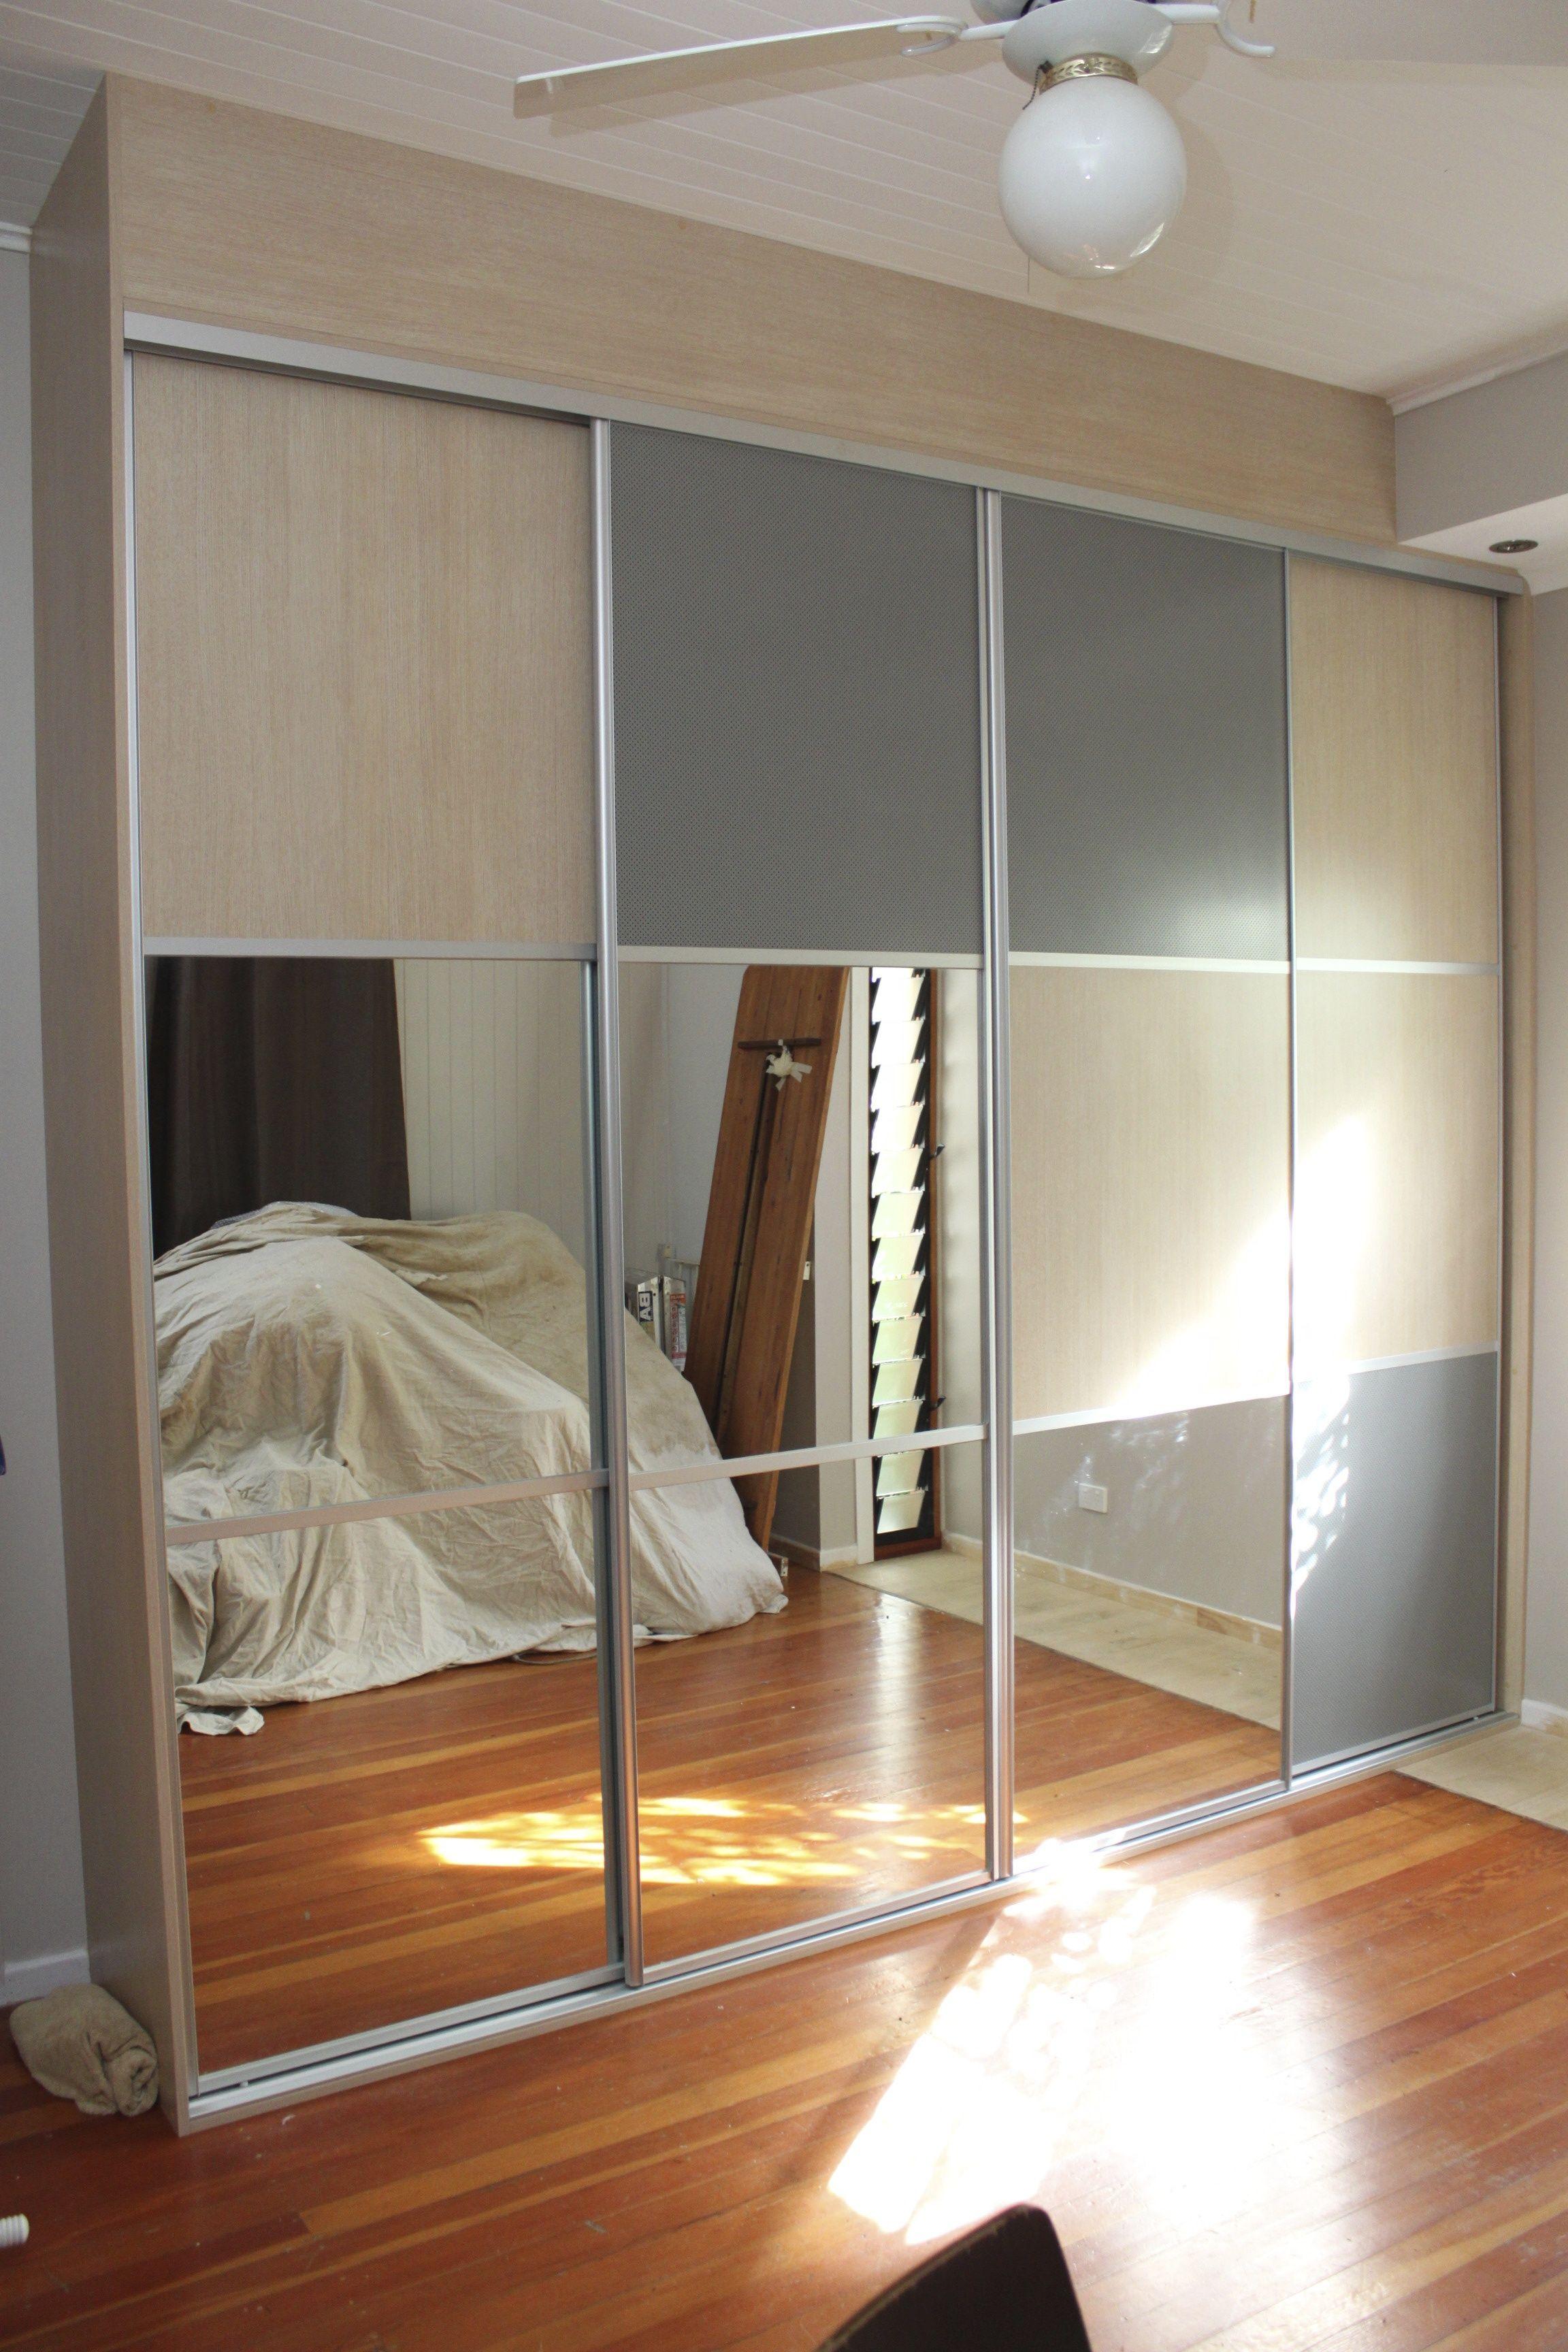 Your home improvements refference mirrored closet doors - Composite Sliding Doors Using Mirror Melamine And Mesh